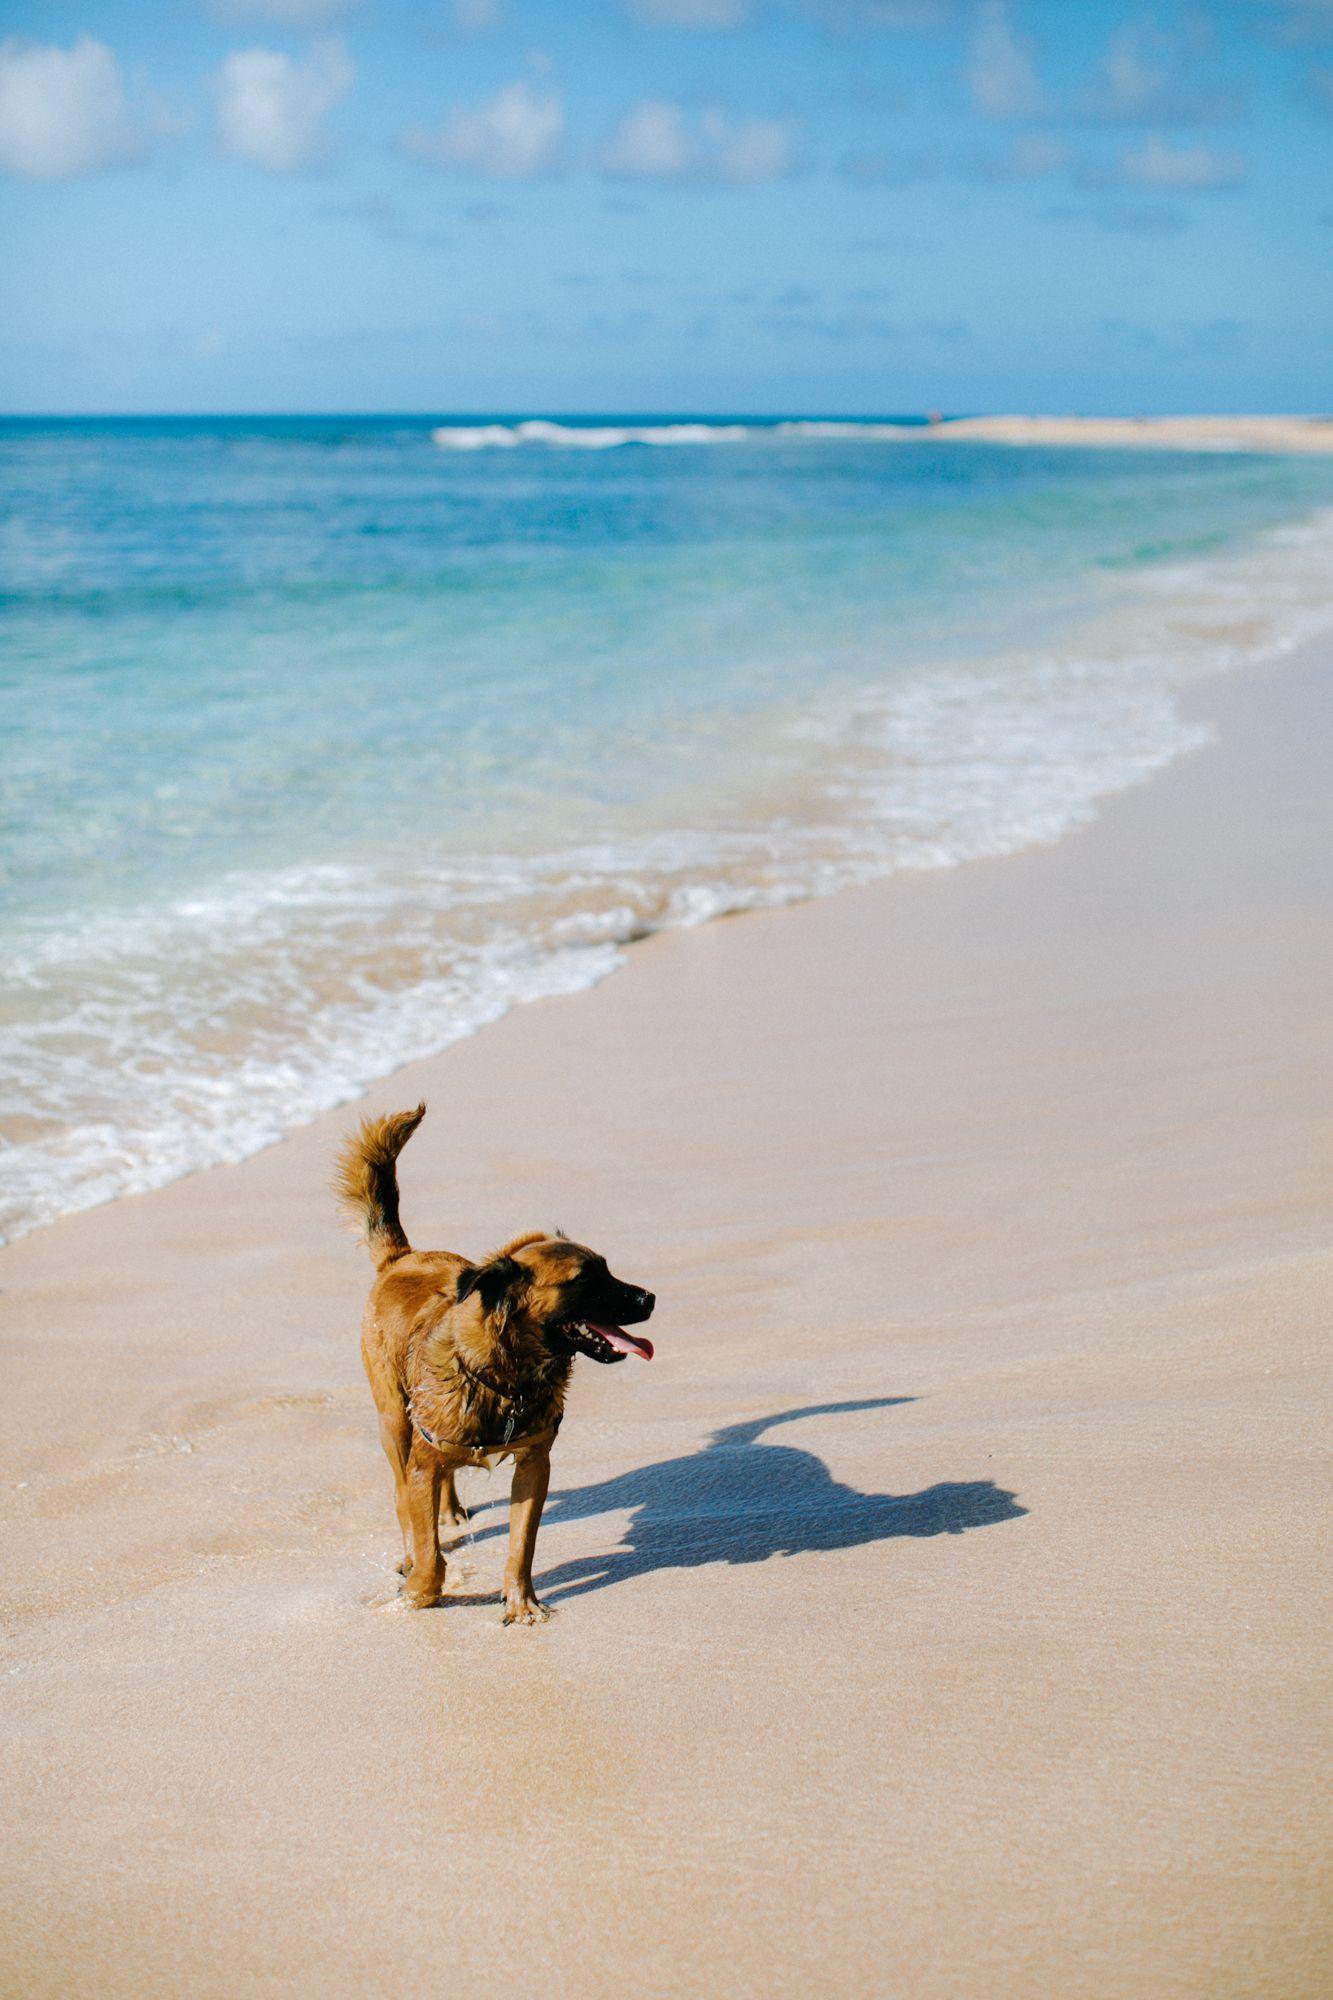 Happy beach puppy north shore oahu hawaii travel